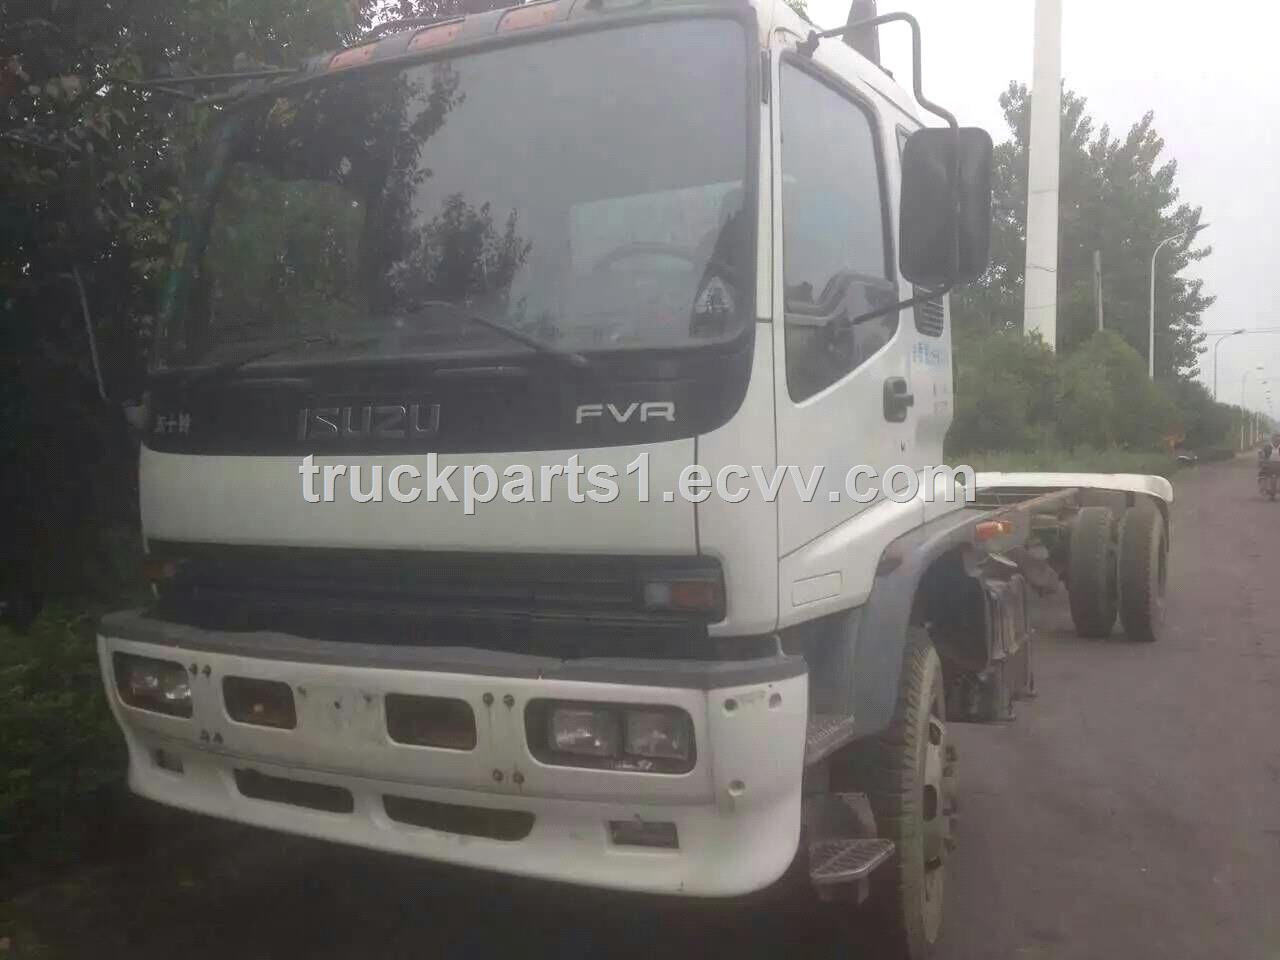 Used ISUZU Truck for sale Mixer truck pump truck dump truck tractor head ISUZU truck engine gearbox cabin rear axle